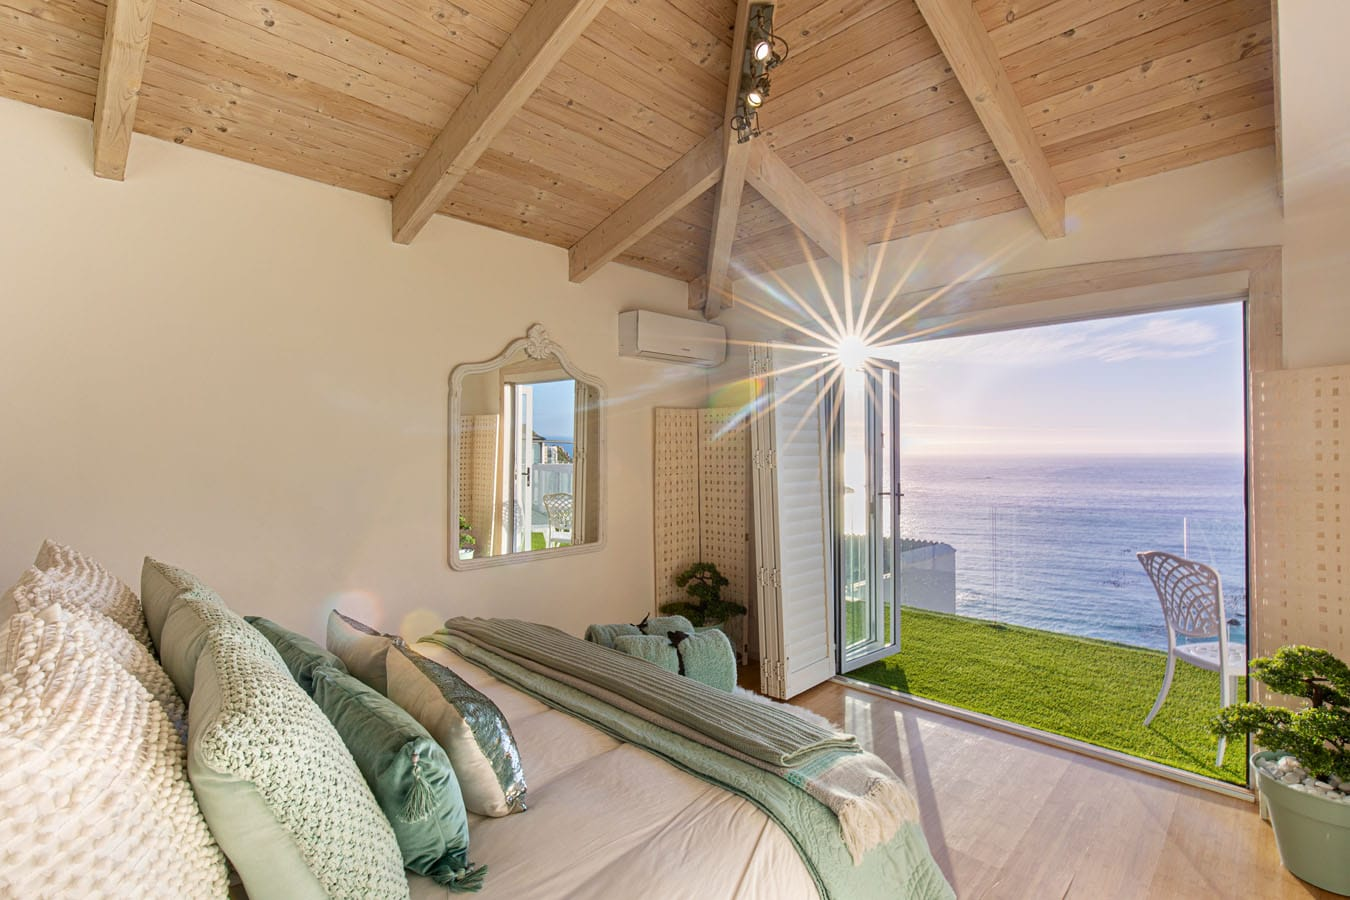 clifton-seaview-penthouse_33